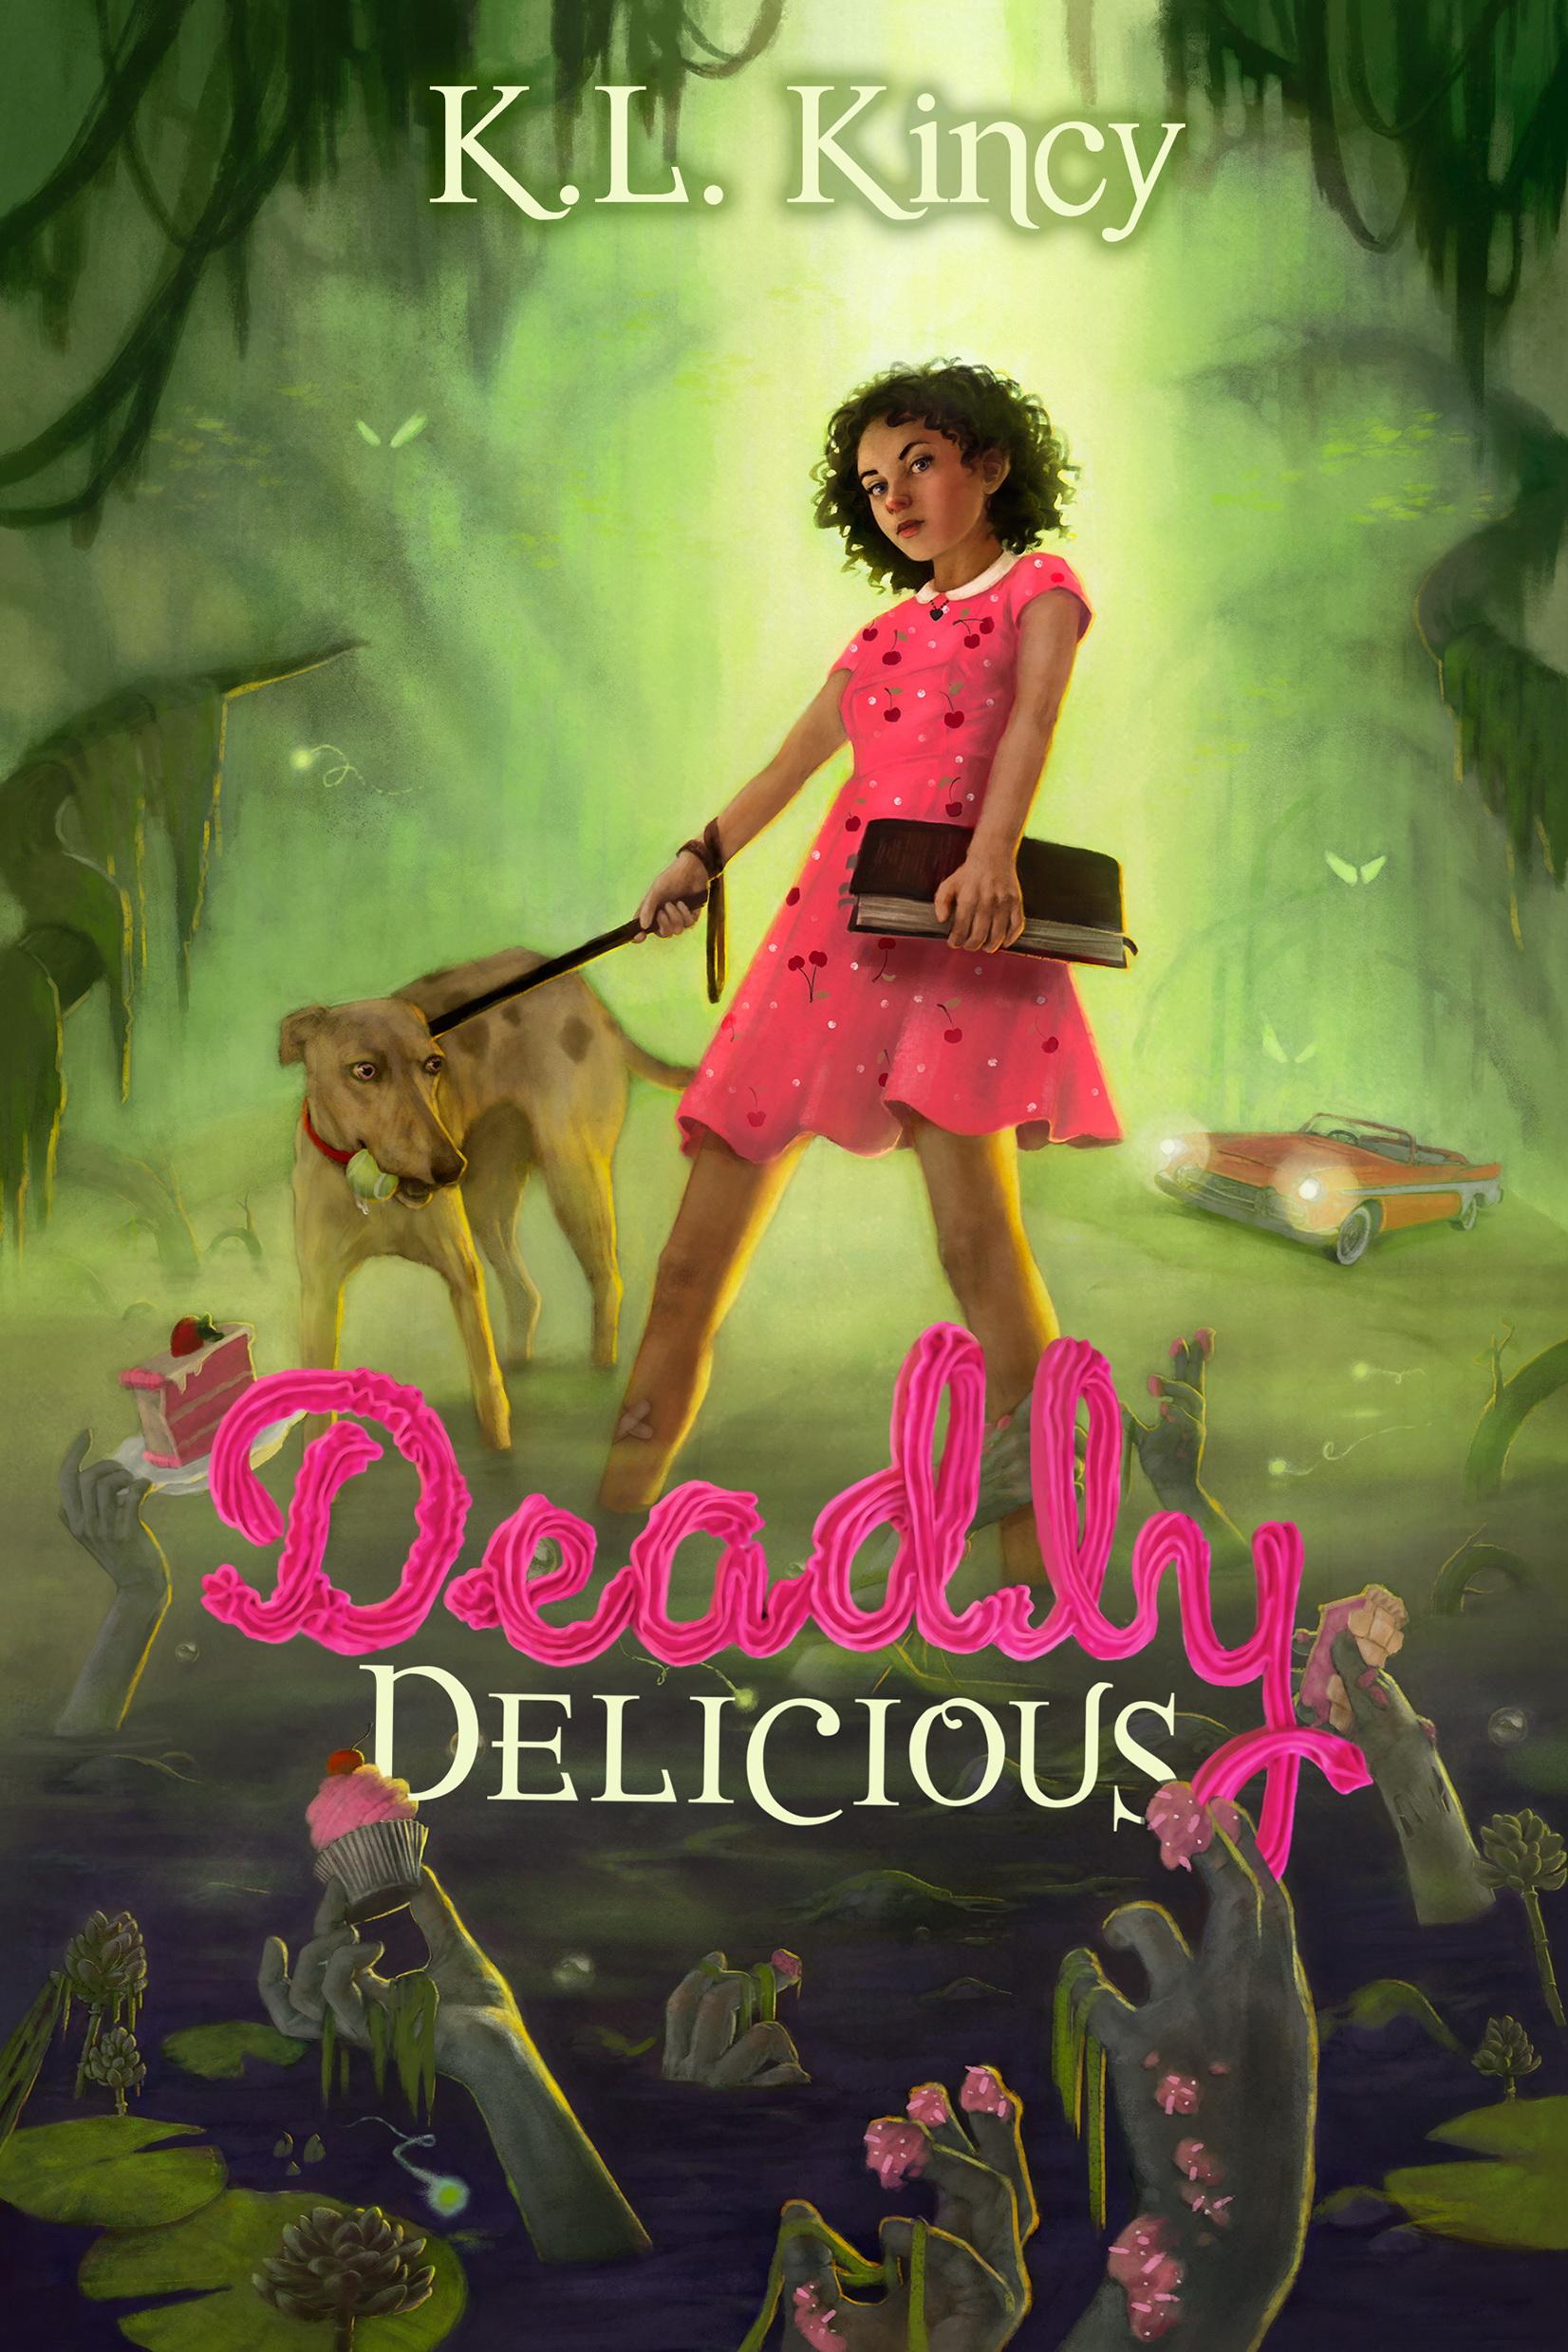 Deadly Delicious - ebook cover (1)